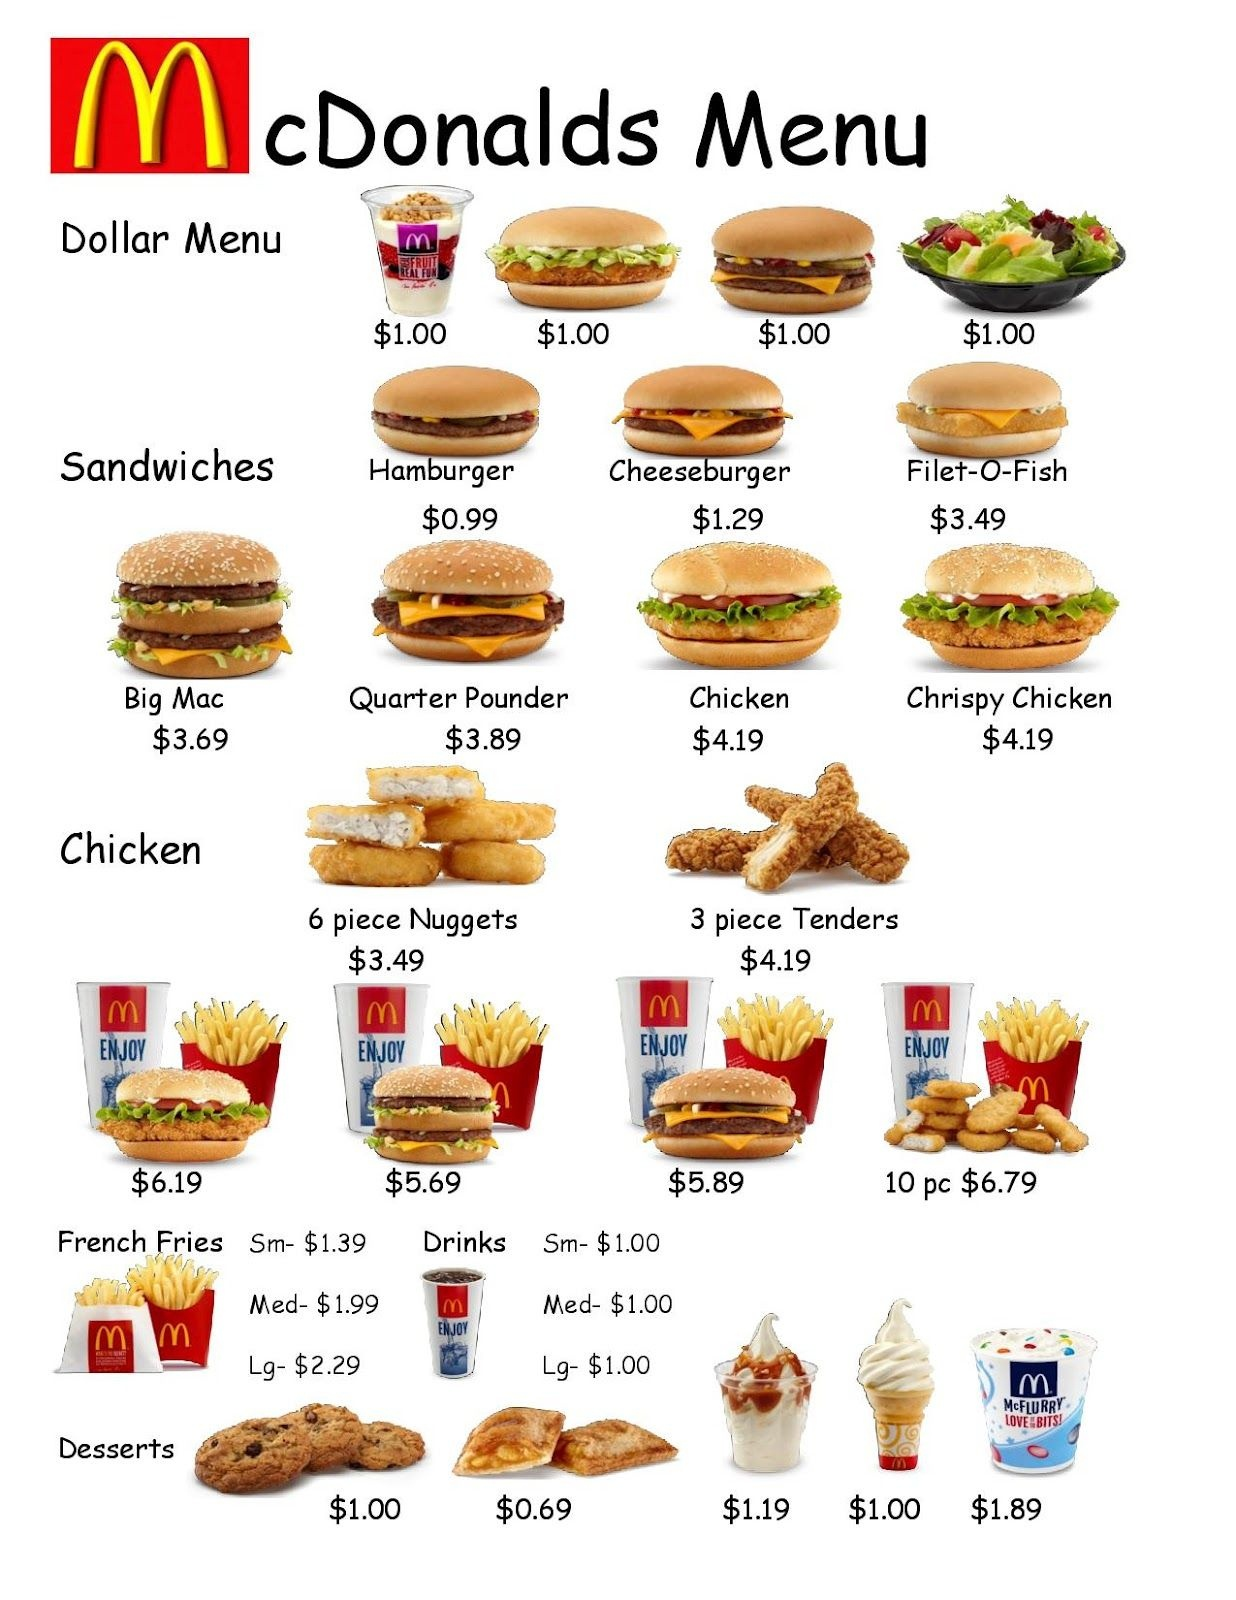 Empoweredthem: Fast Food Worksheet 1 | Learning Life Skills - Free Printable Menu Math Worksheets